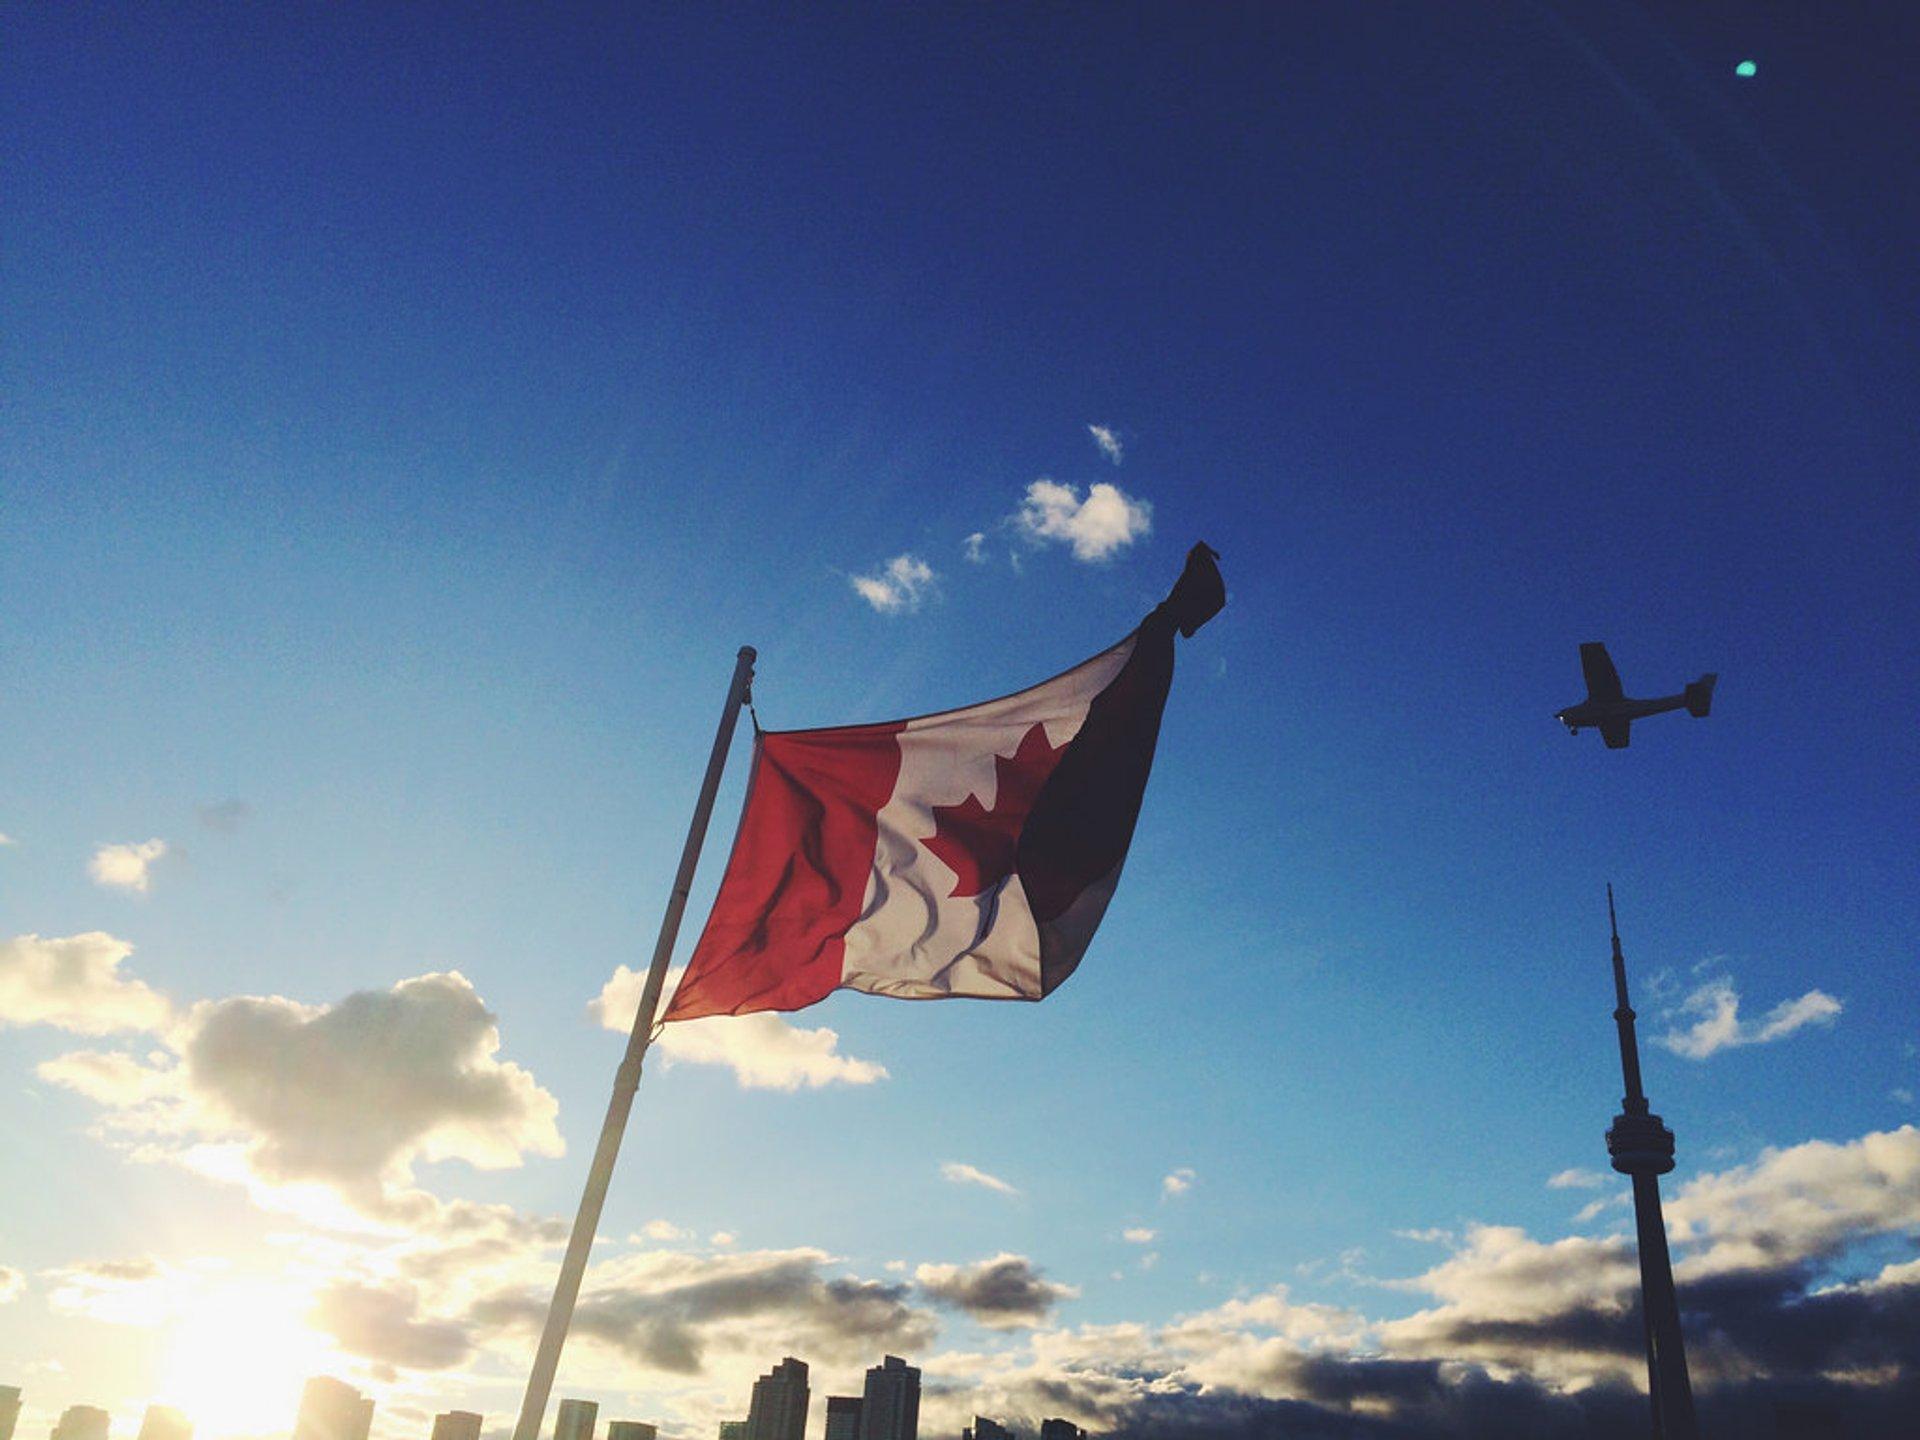 Canada Day in Toronto - Best Season 2020